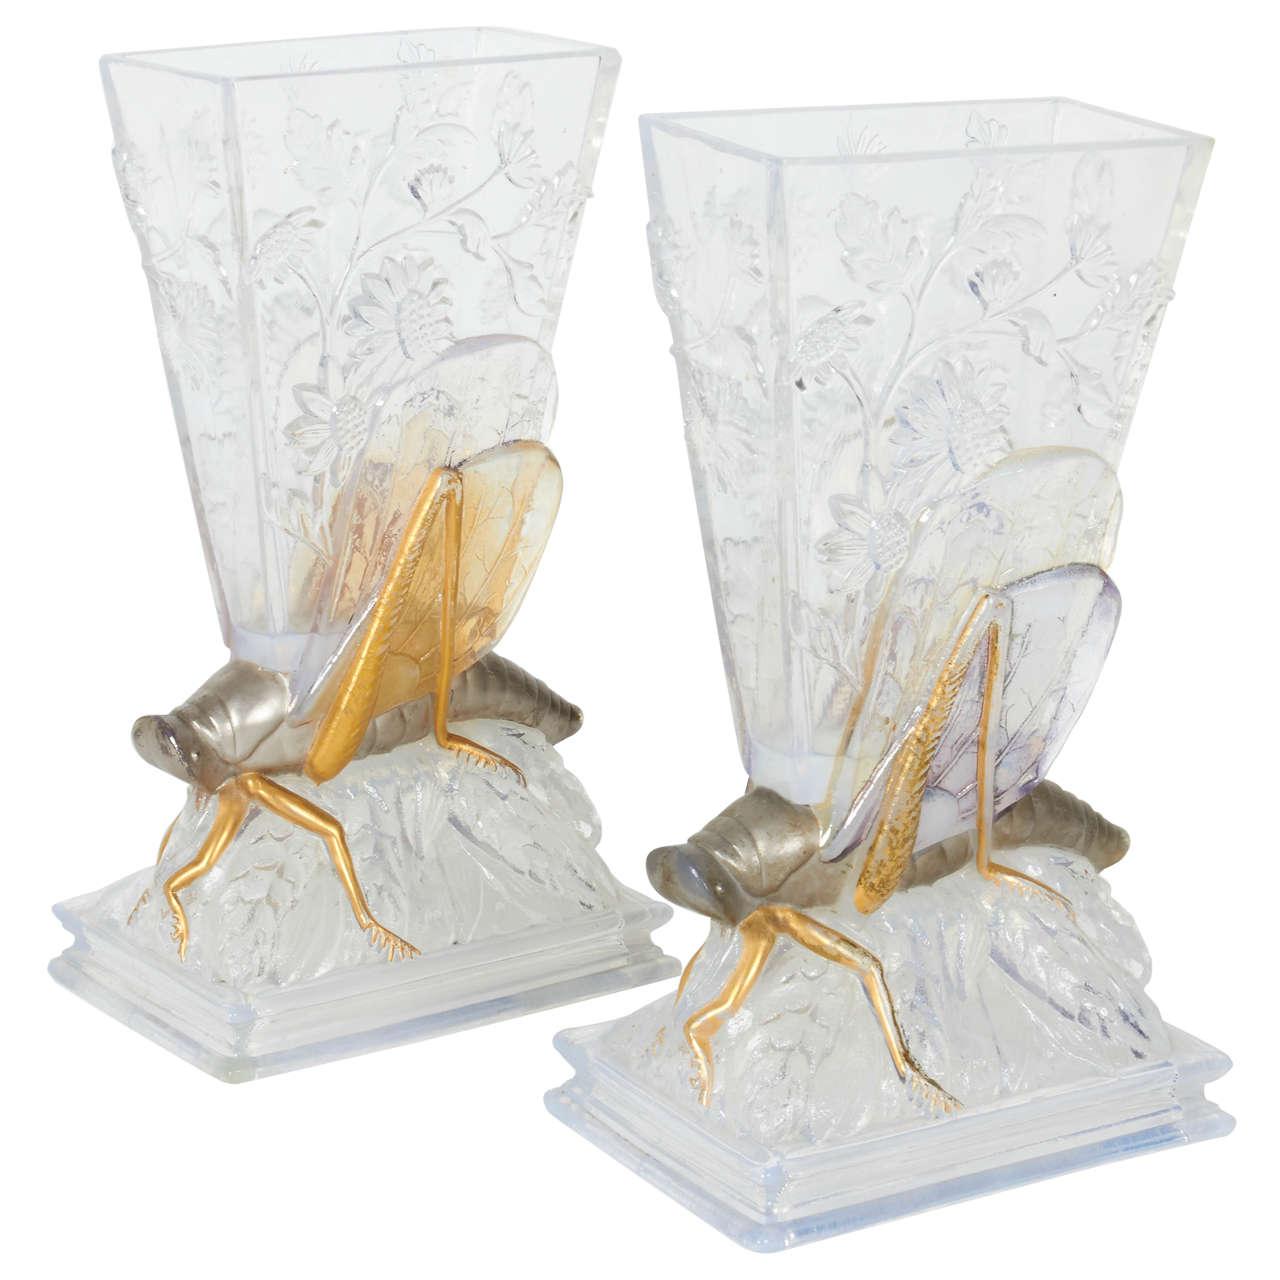 Rare pair of baccarat crystal grasshopper vases at 1stdibs - Baccarat stemware ...